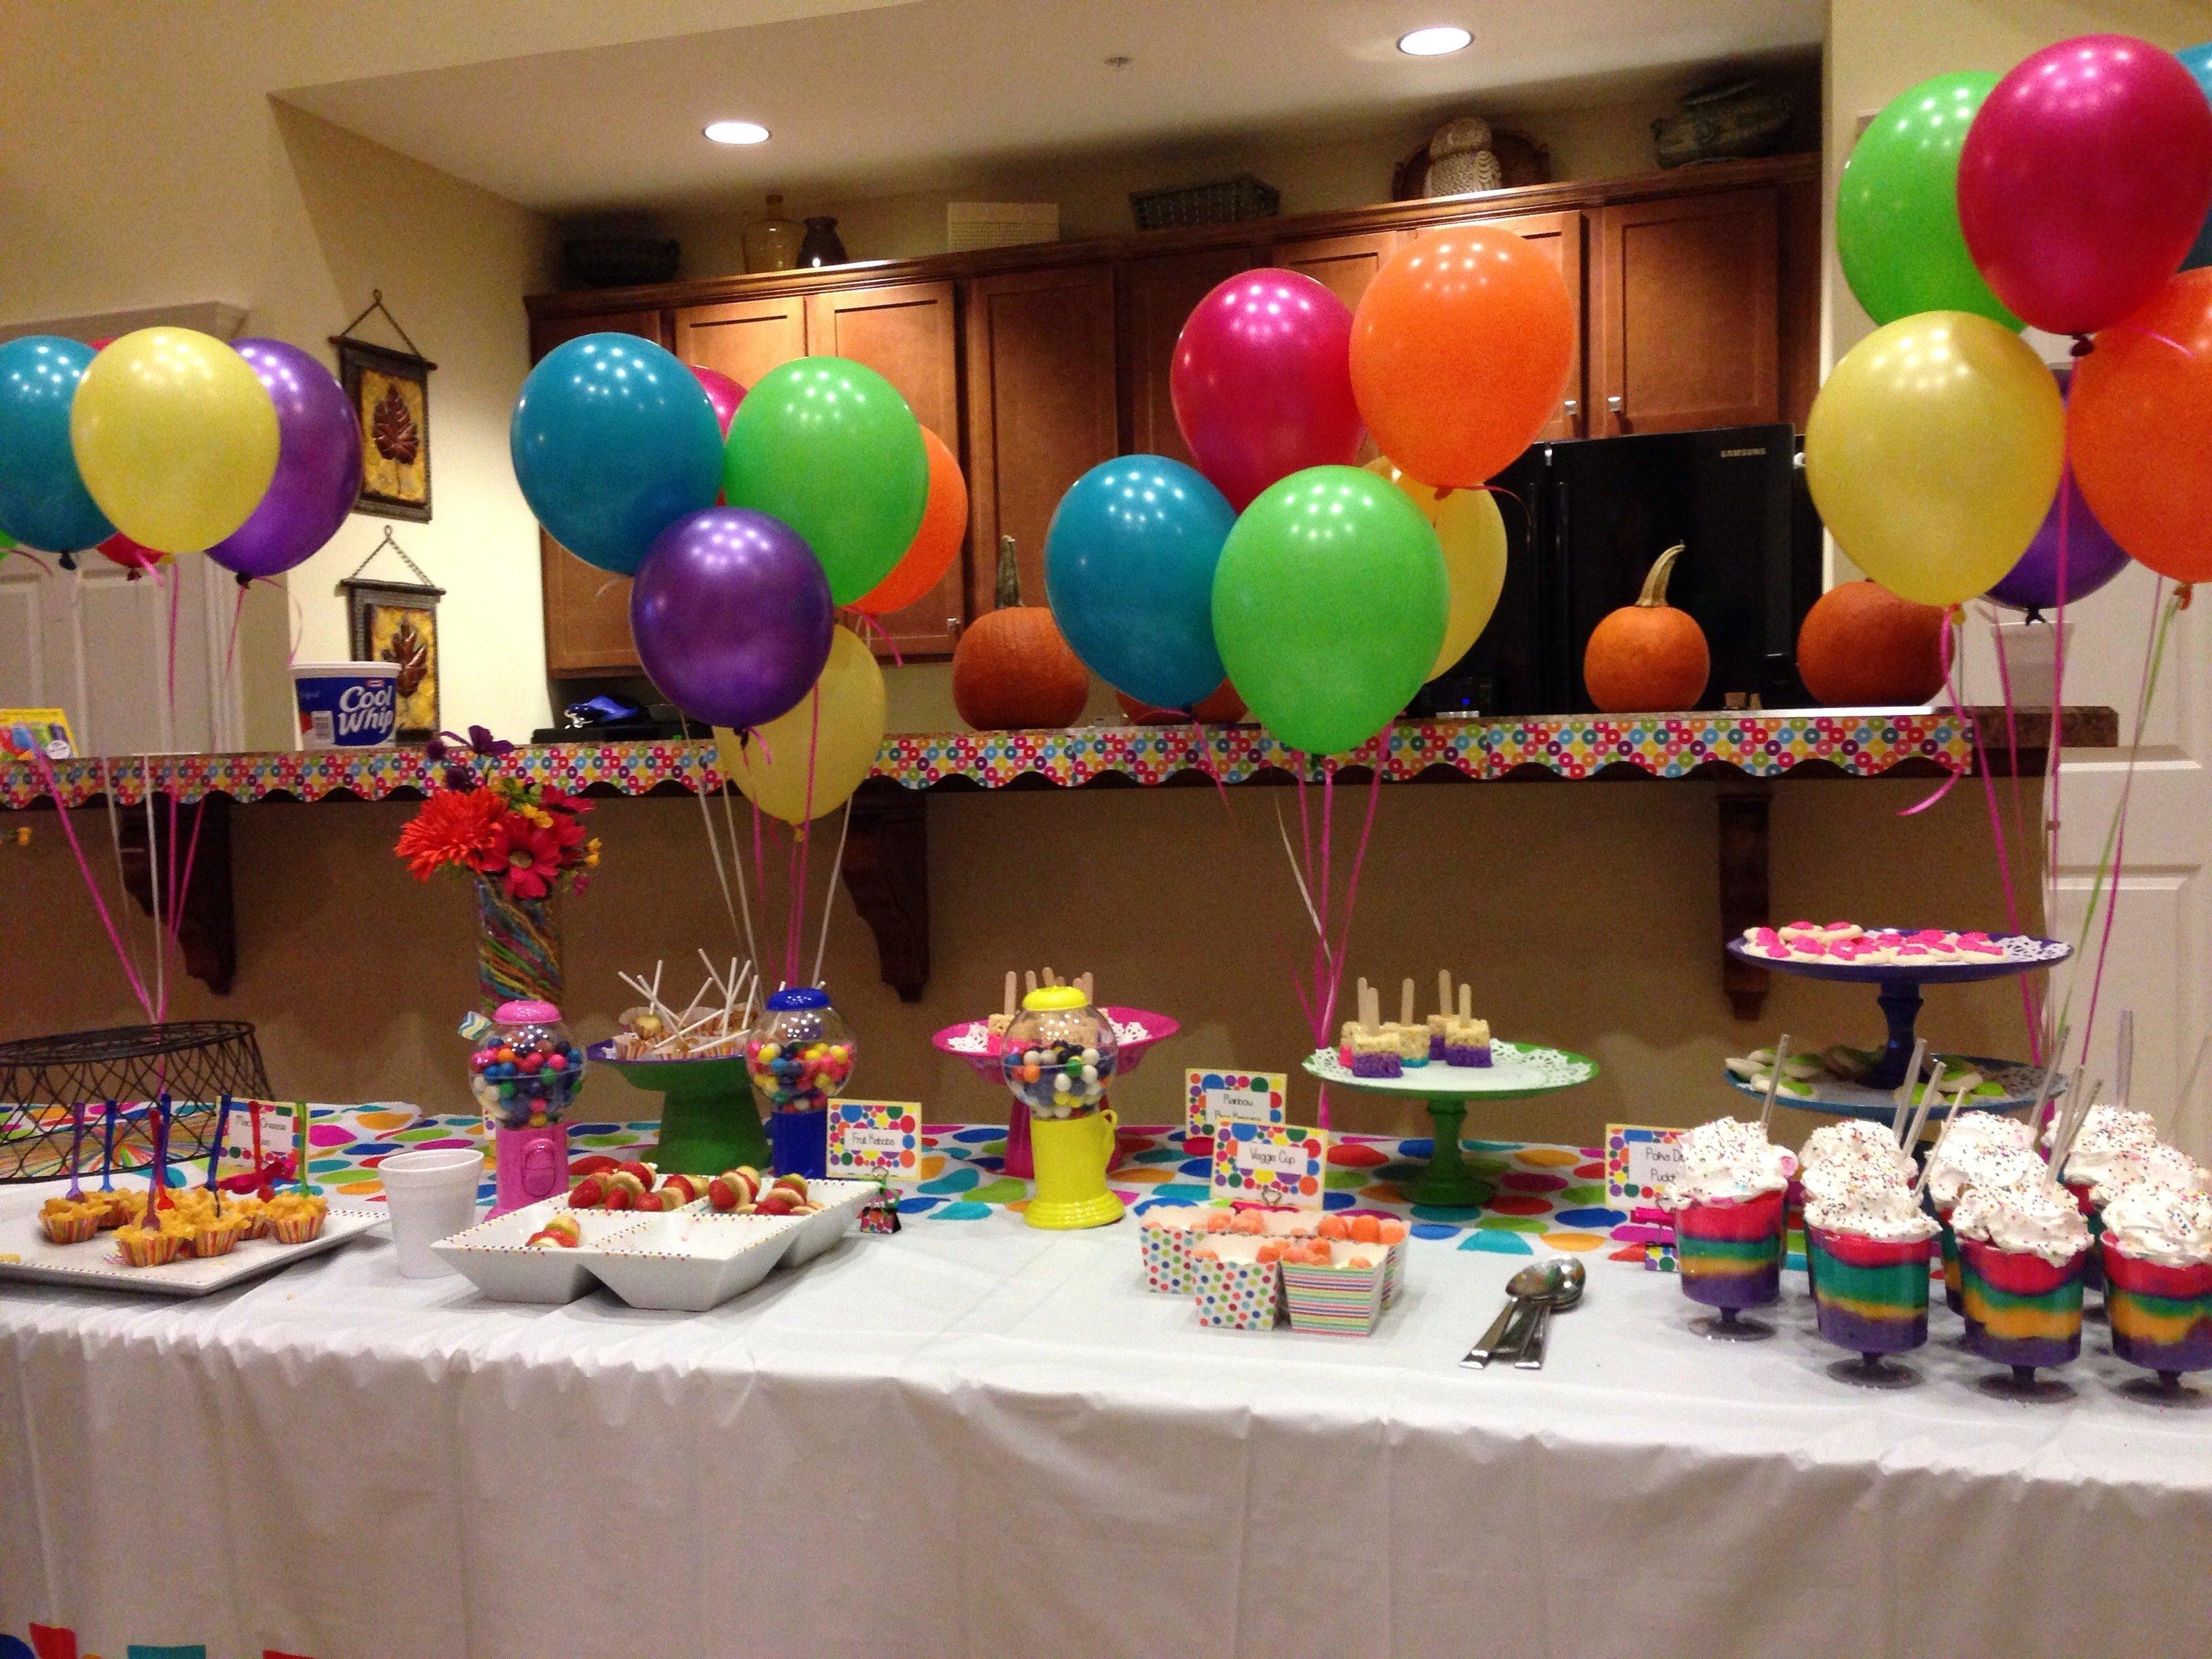 10 Stunning Birthday Ideas For 2 Year Old Boy themes birthday ideas for a 8 year old birthday party in 5 2020